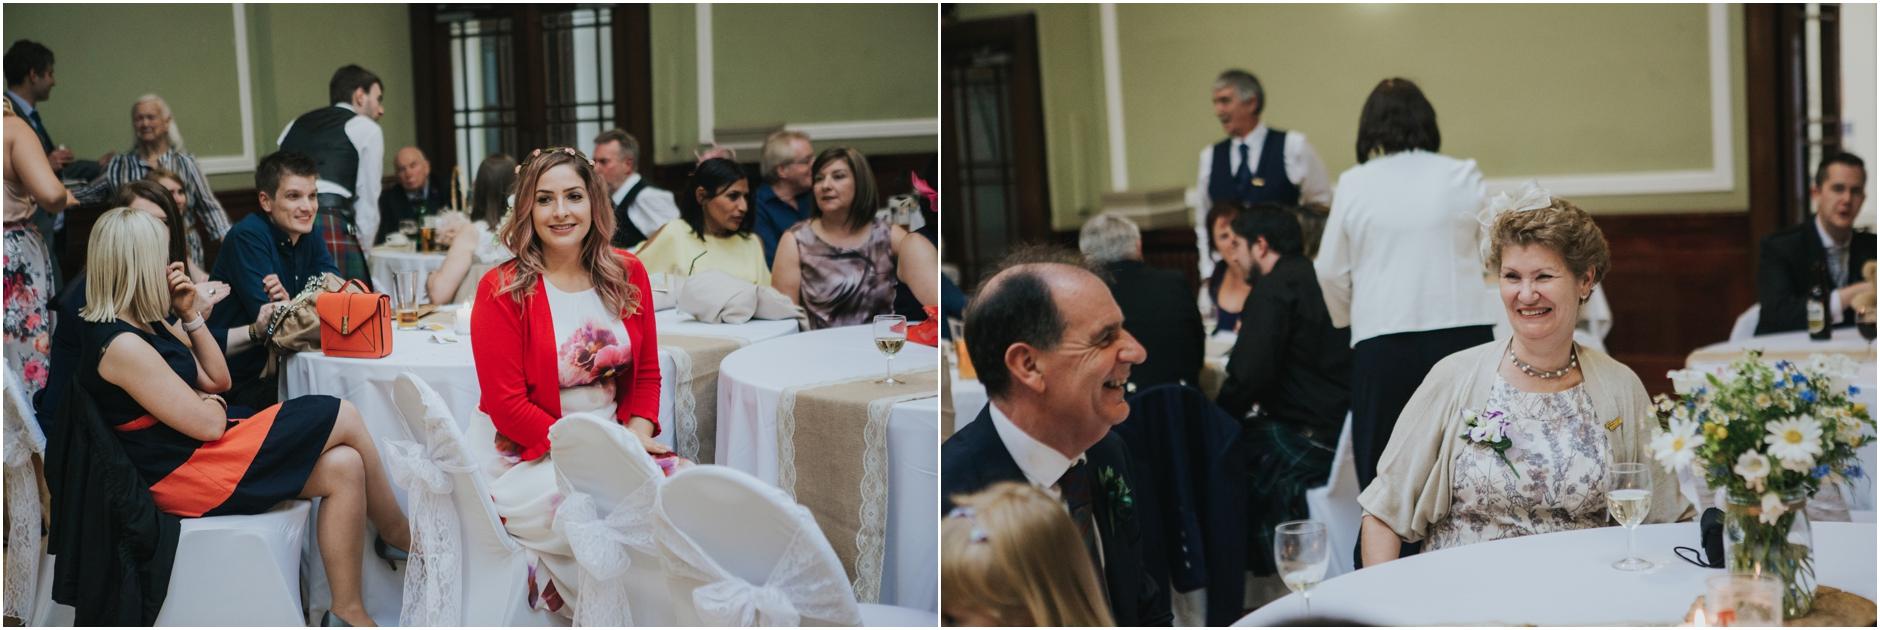 wedding reception thomas morton hall leith theatre edinburgh